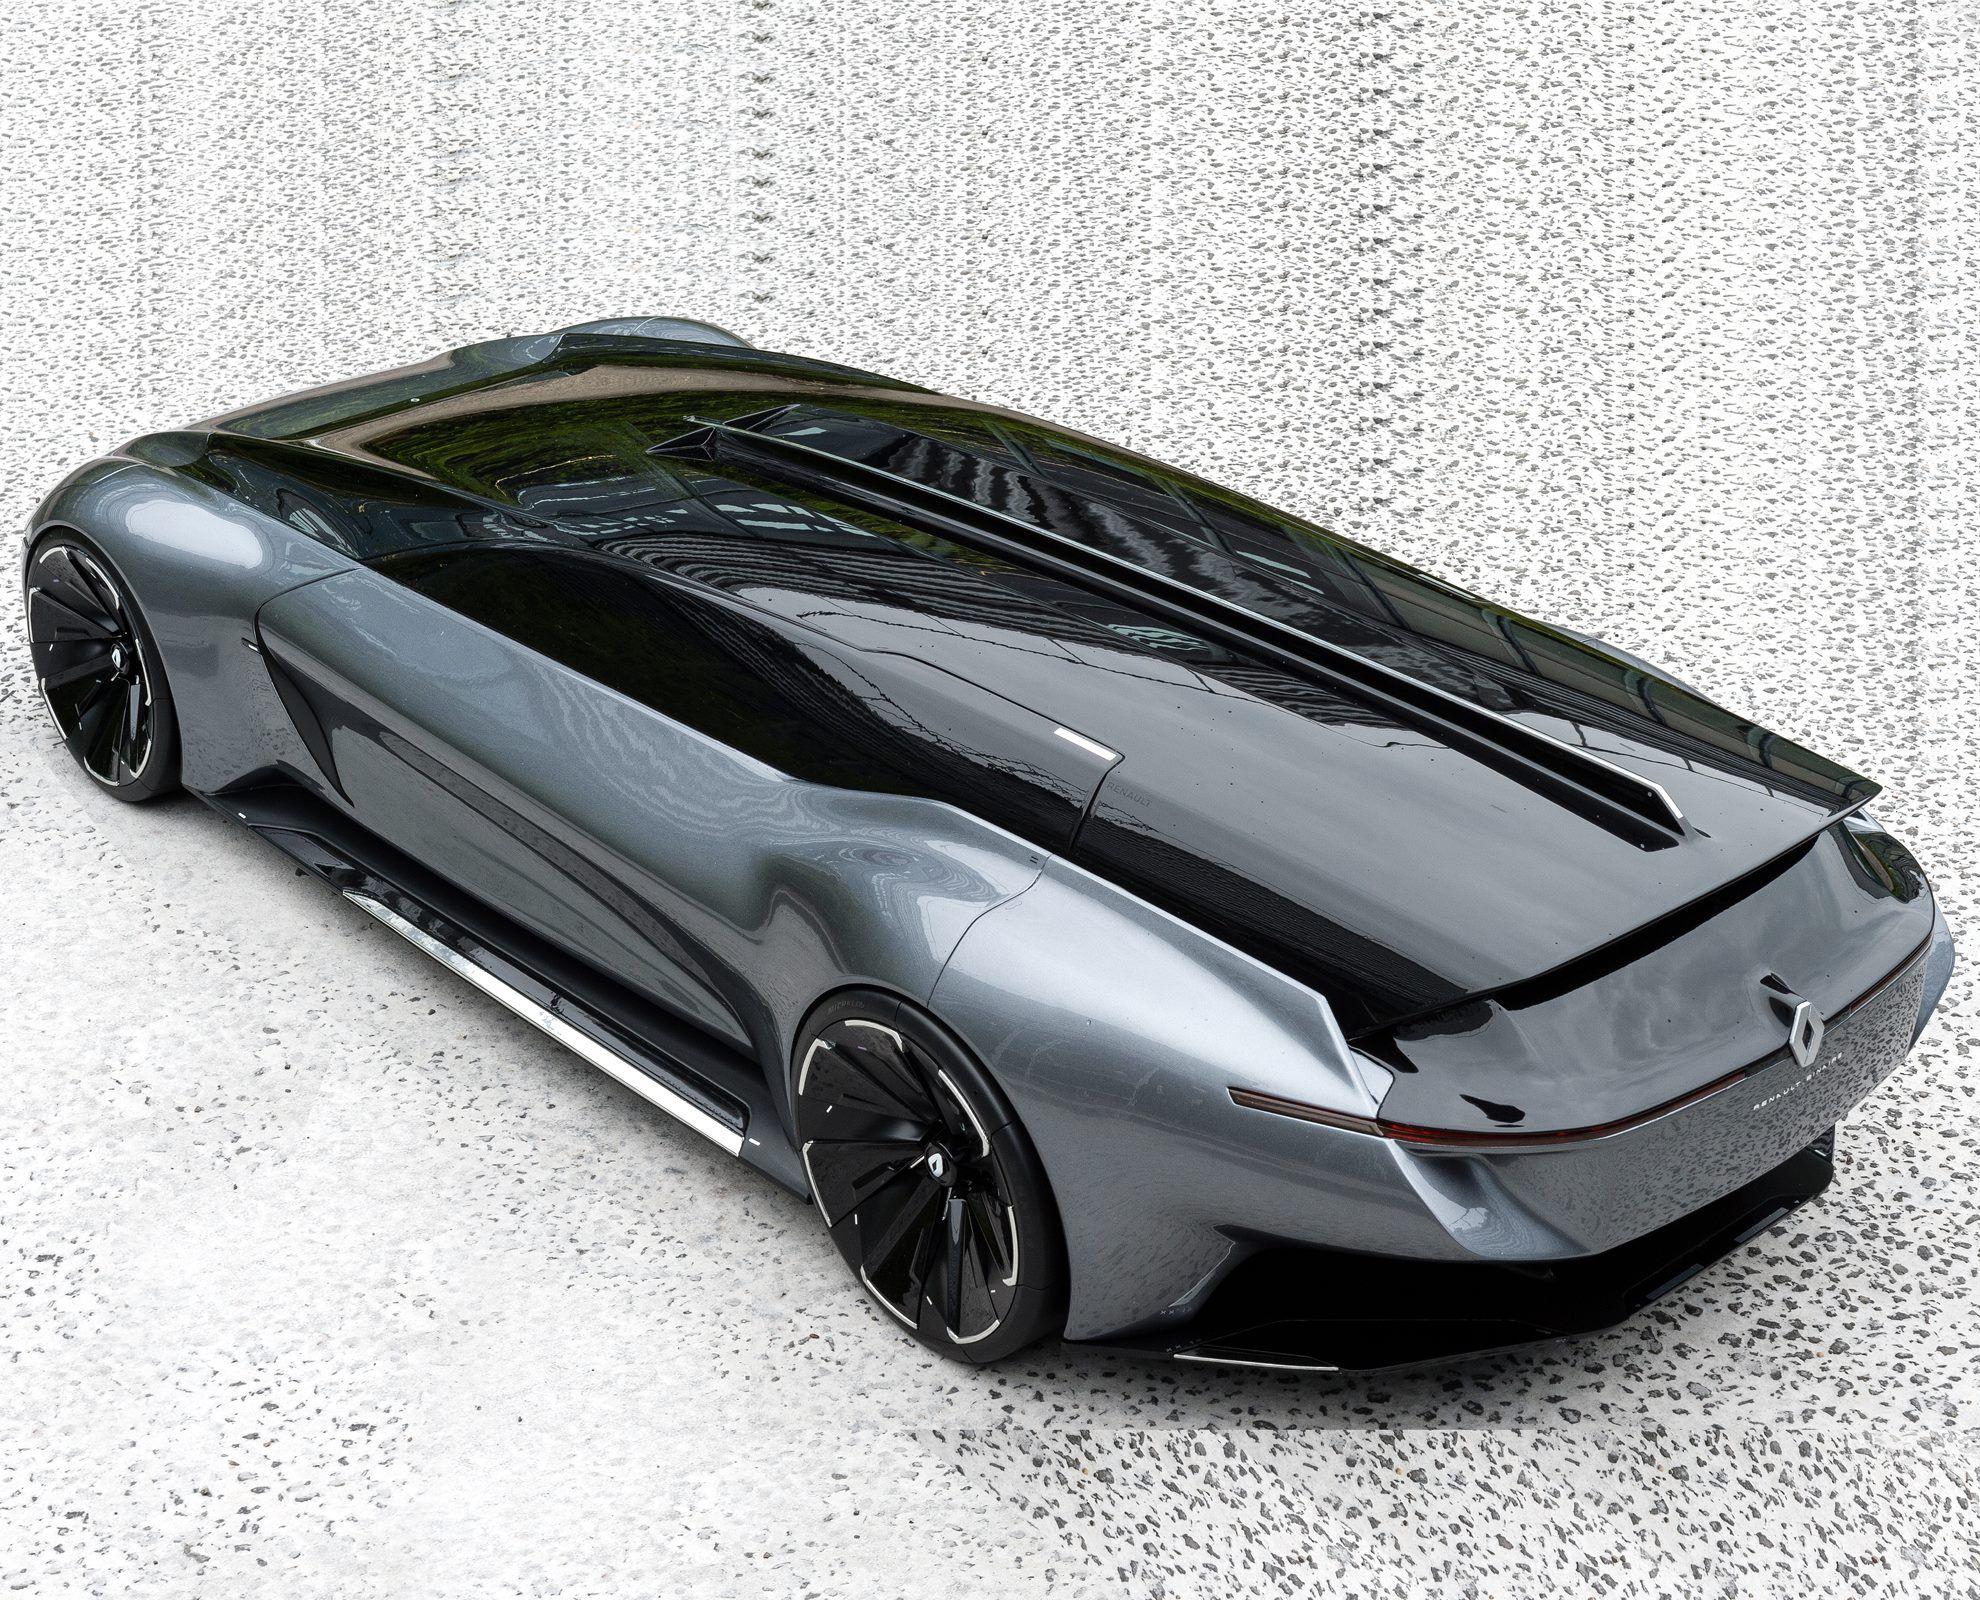 20232003 744624625733467 7723243728210131463 O Jpg 1980 1600 Futuristic Cars Concept Car Design Unique Cars